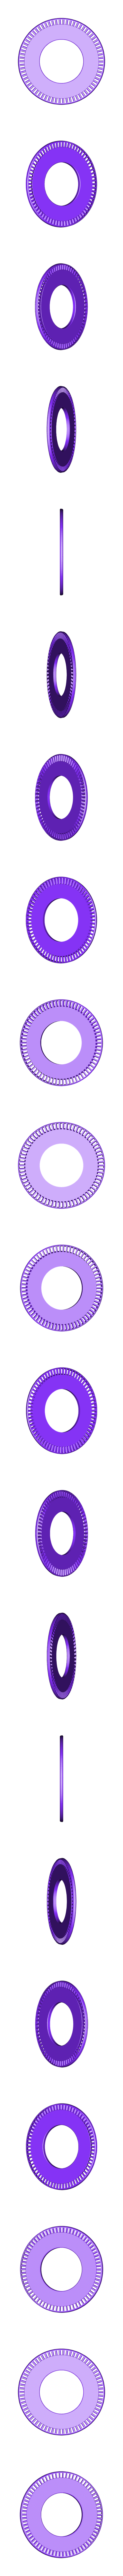 Turbine-HP-Rotor101.stl Download free STL file Turboprop Engine Modified Parts (No.2) • 3D printable design, konchan77